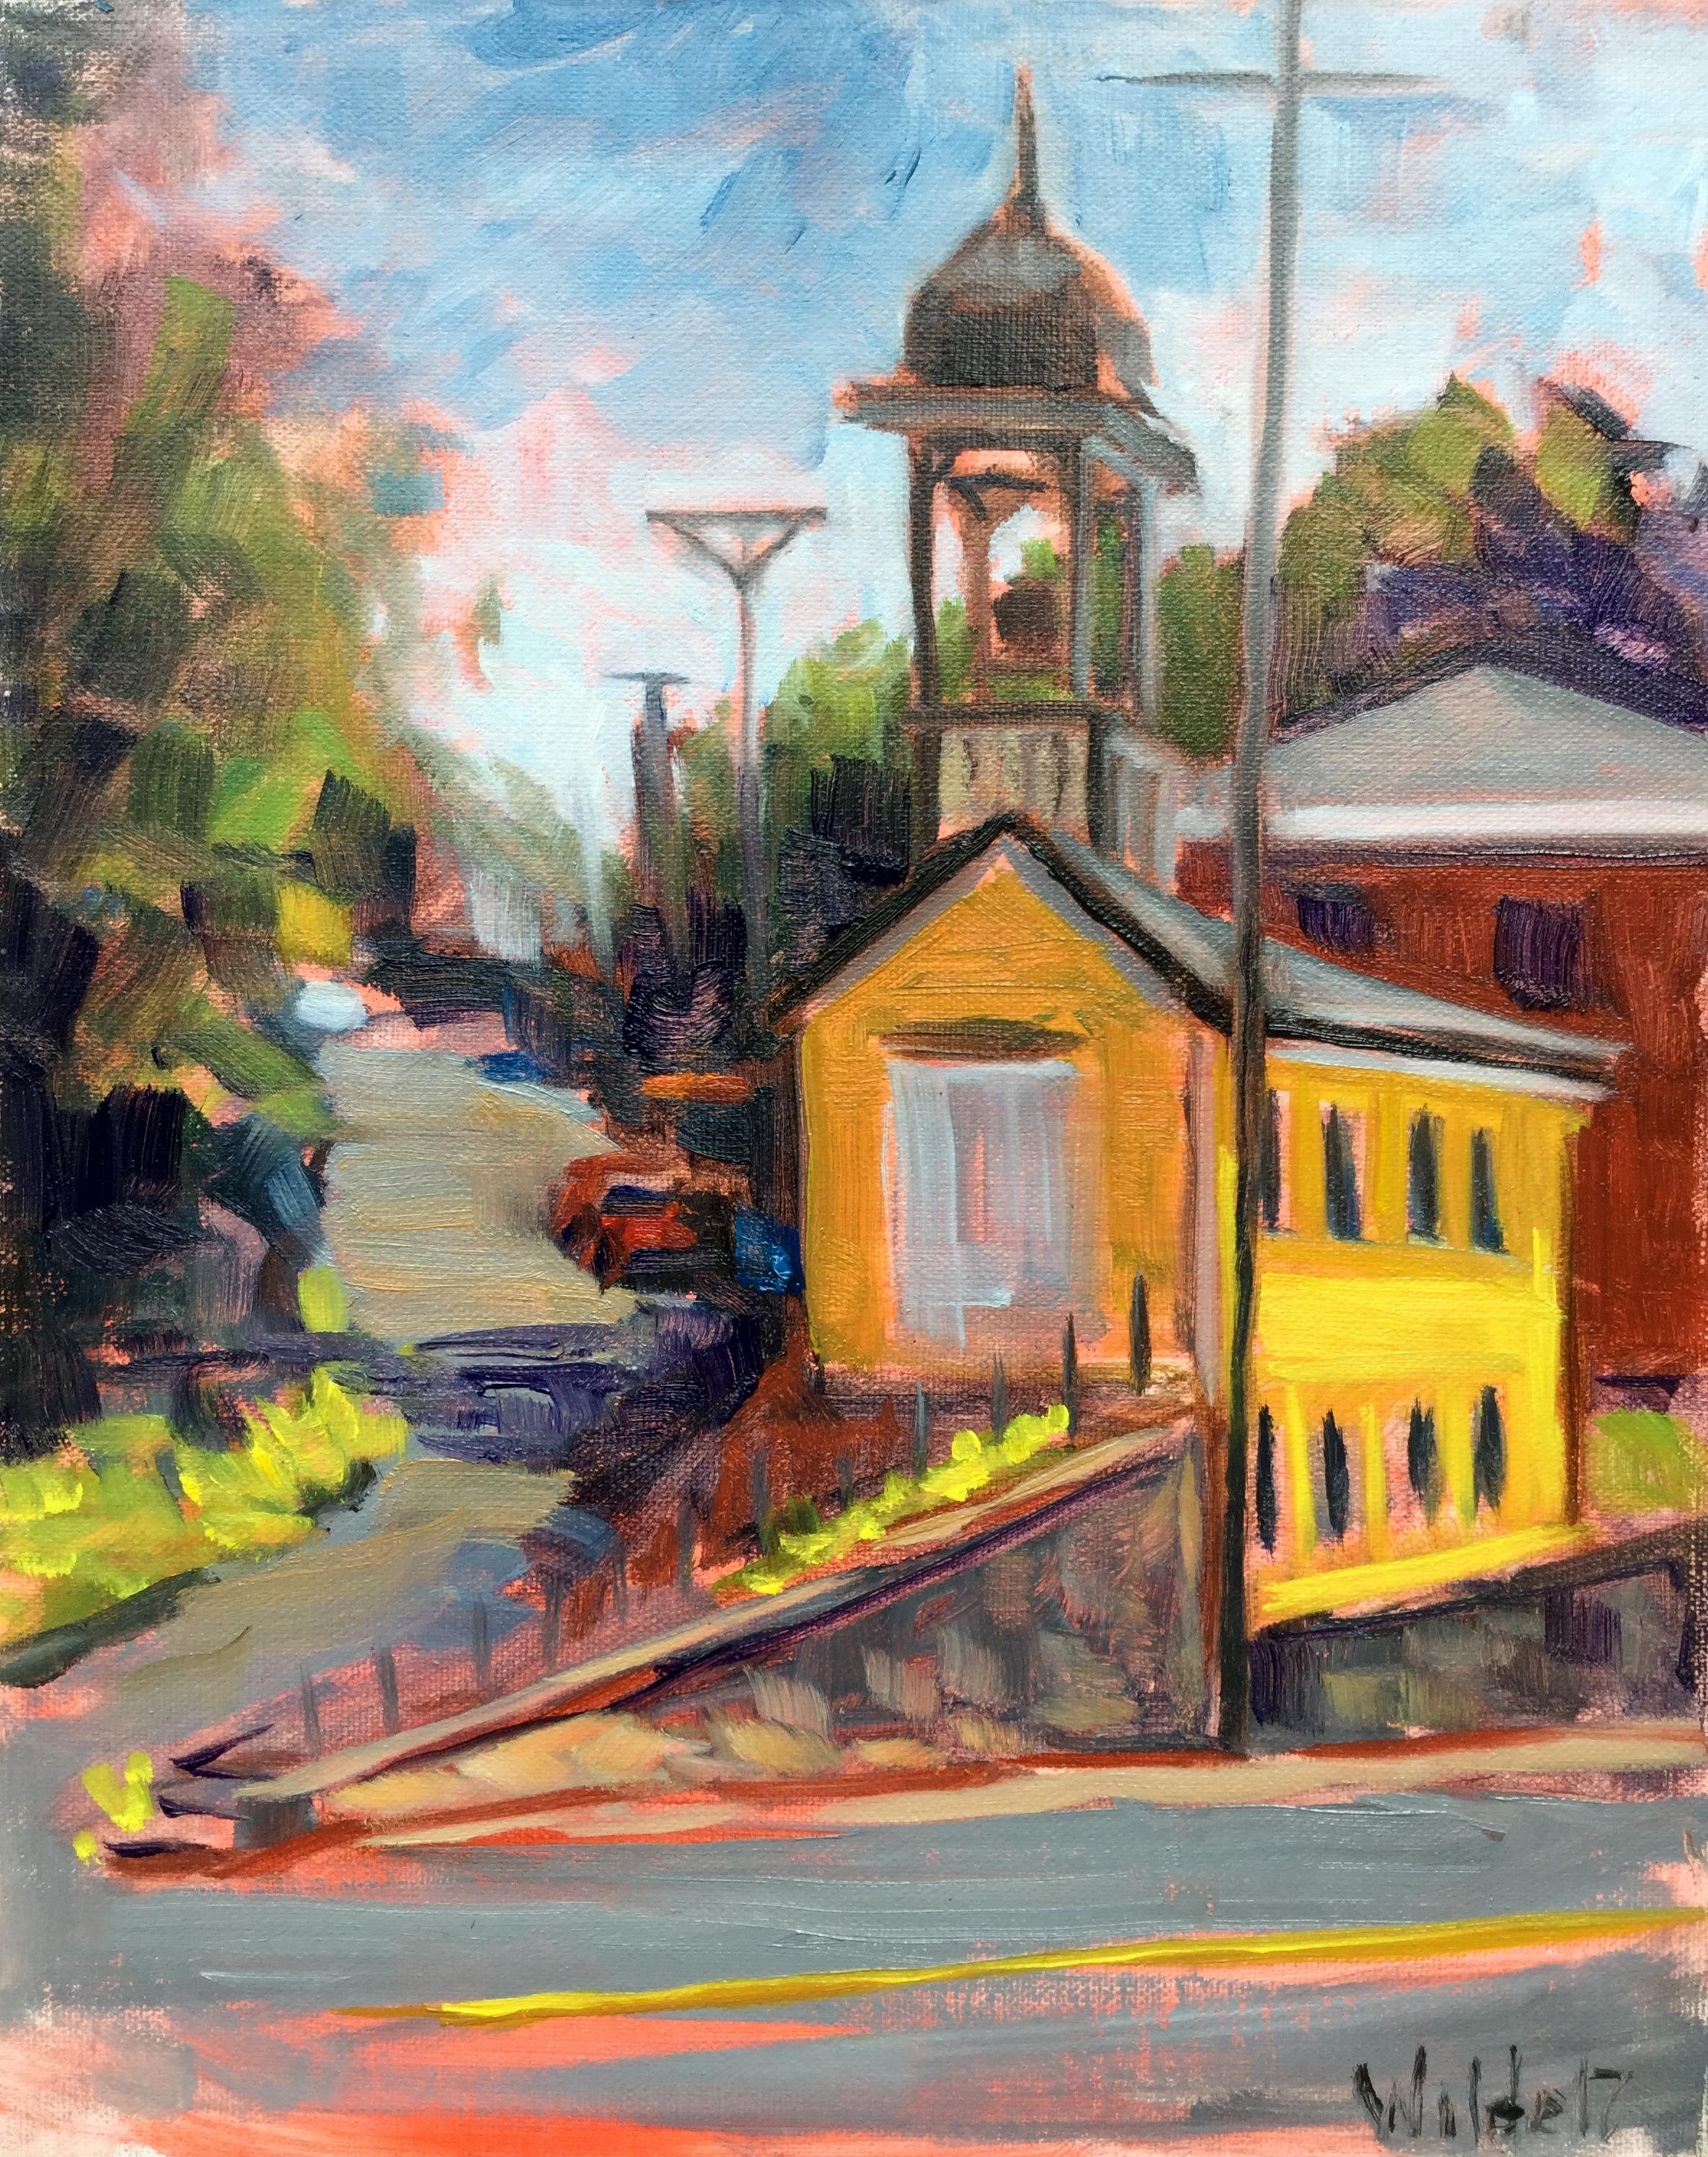 Fire House Yellow • Pamela Wilde